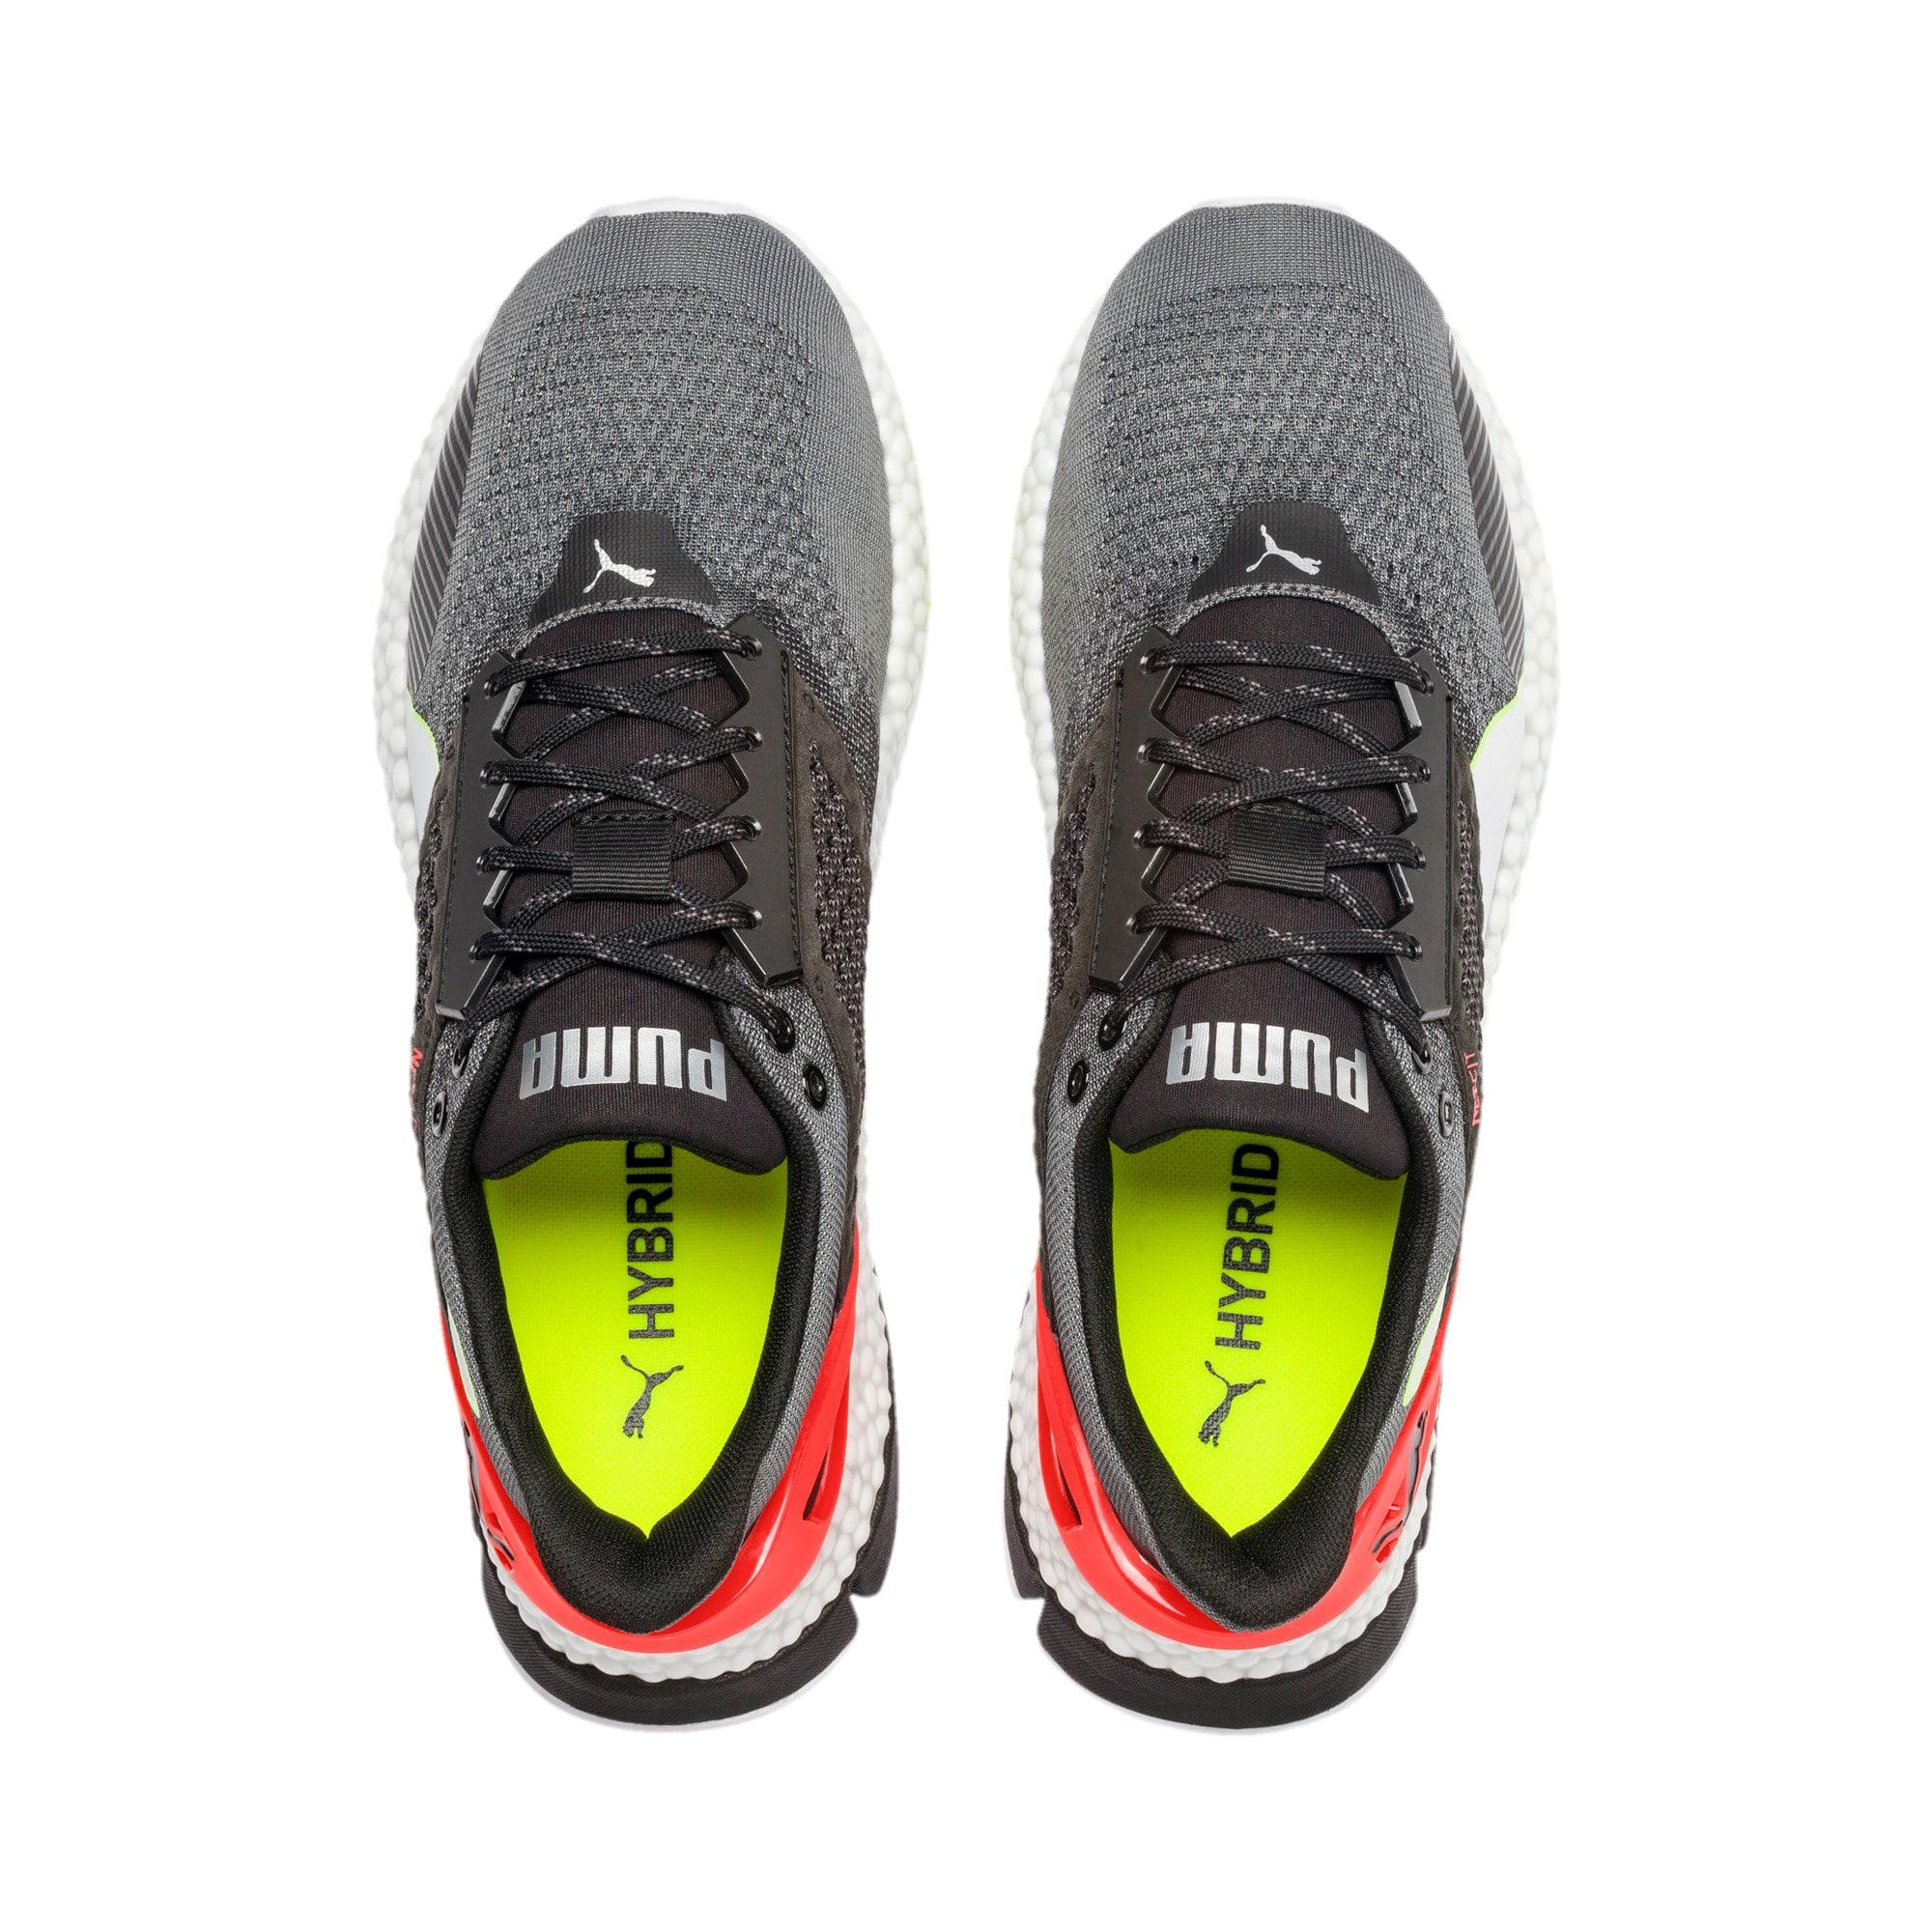 Thumbnail 7 of HYBRID NETFIT Astro Men's Running Shoes, CASTLEROCK-Puma Blck-Ngy Red, medium